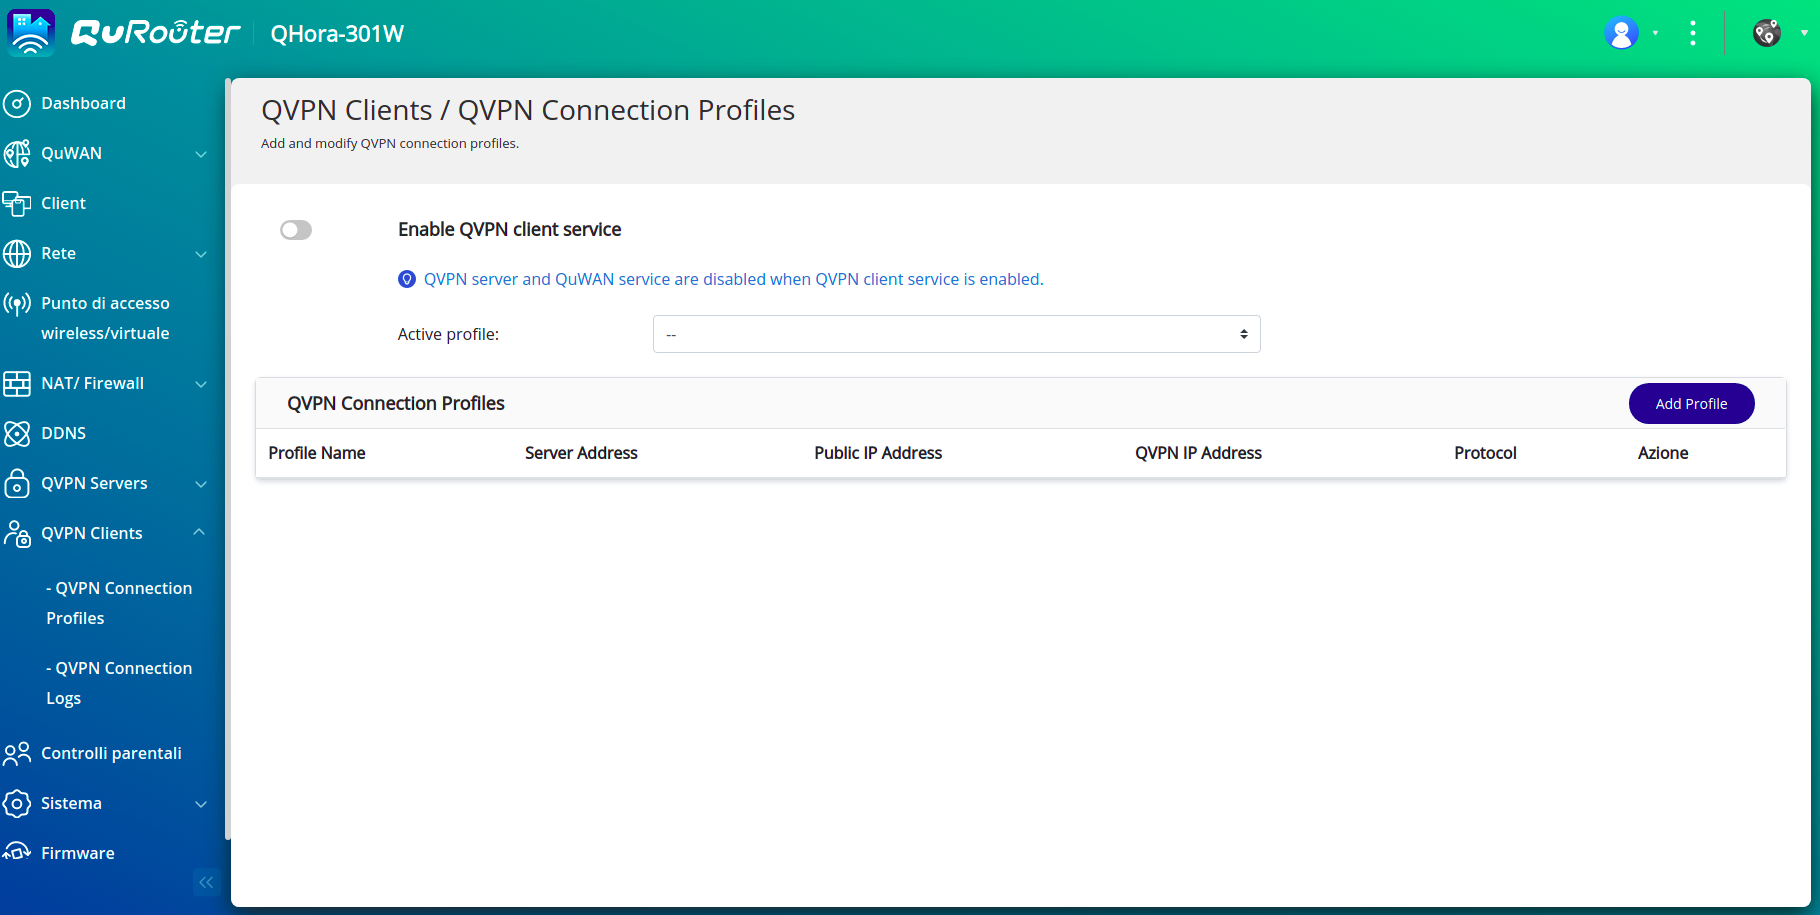 QNAP QHORA 301W - Rete Wireless - QVPN 2